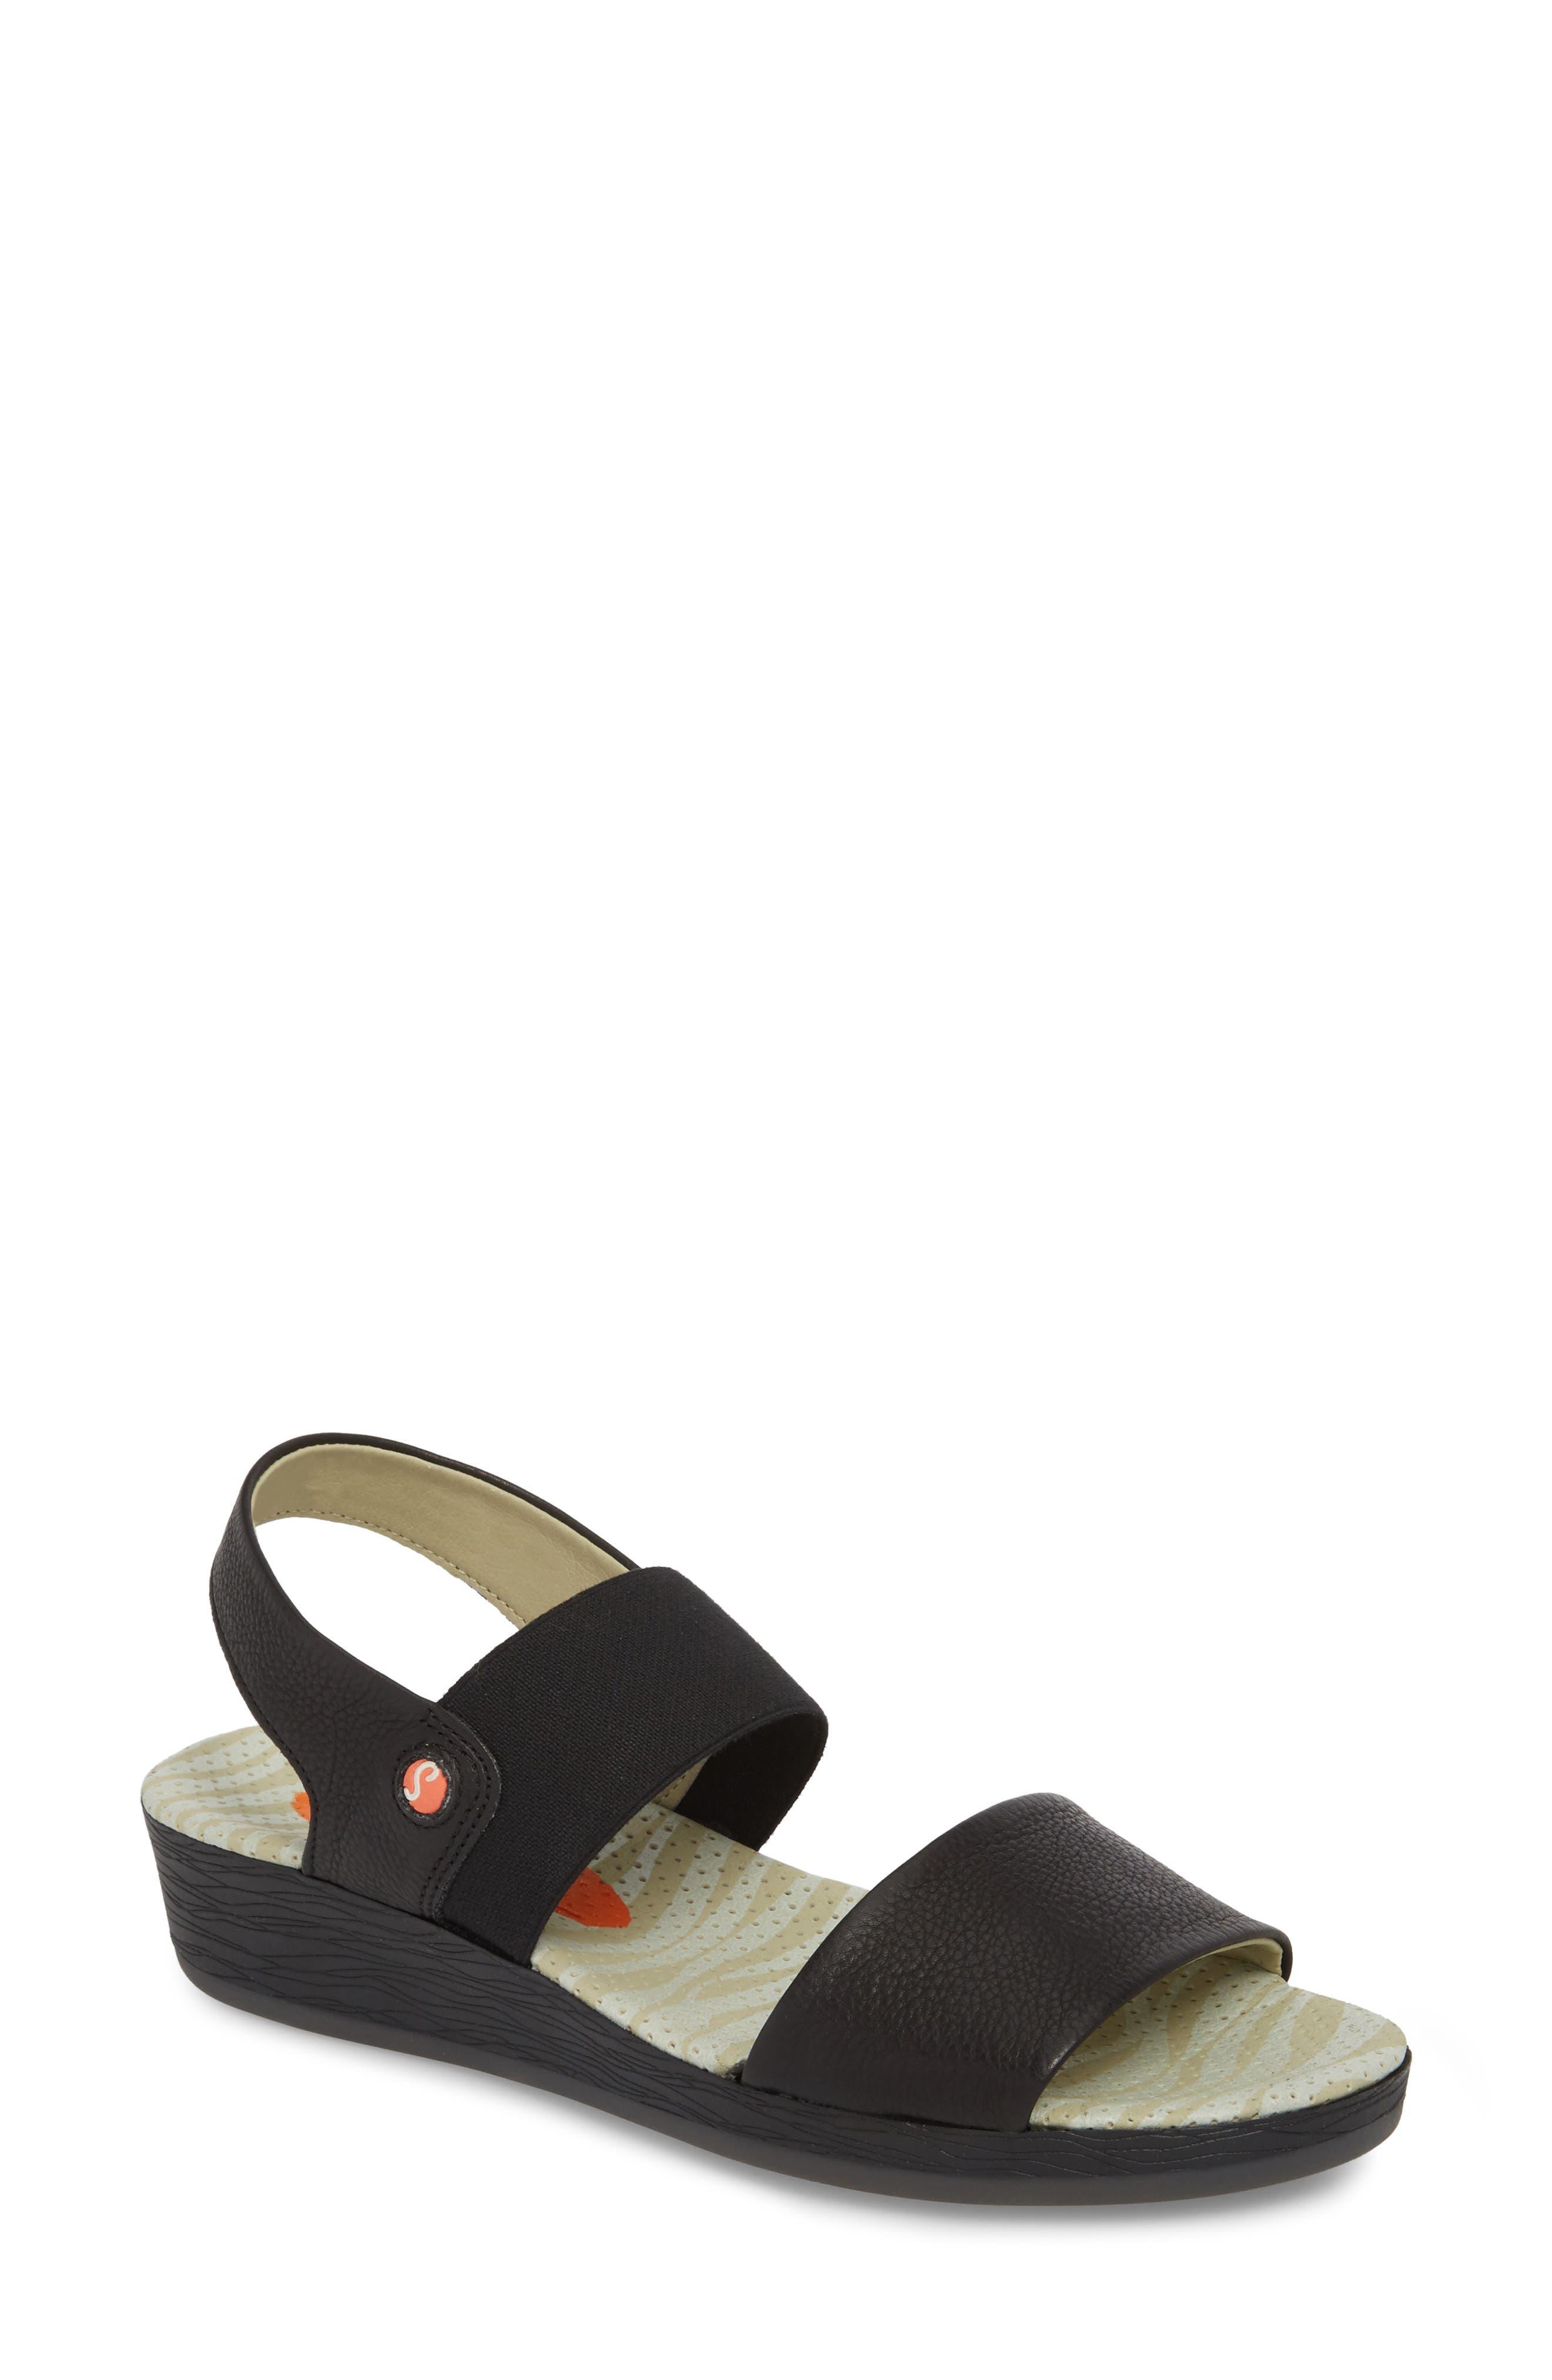 Softinos By Fly London Alp425Sof Sandal - Black